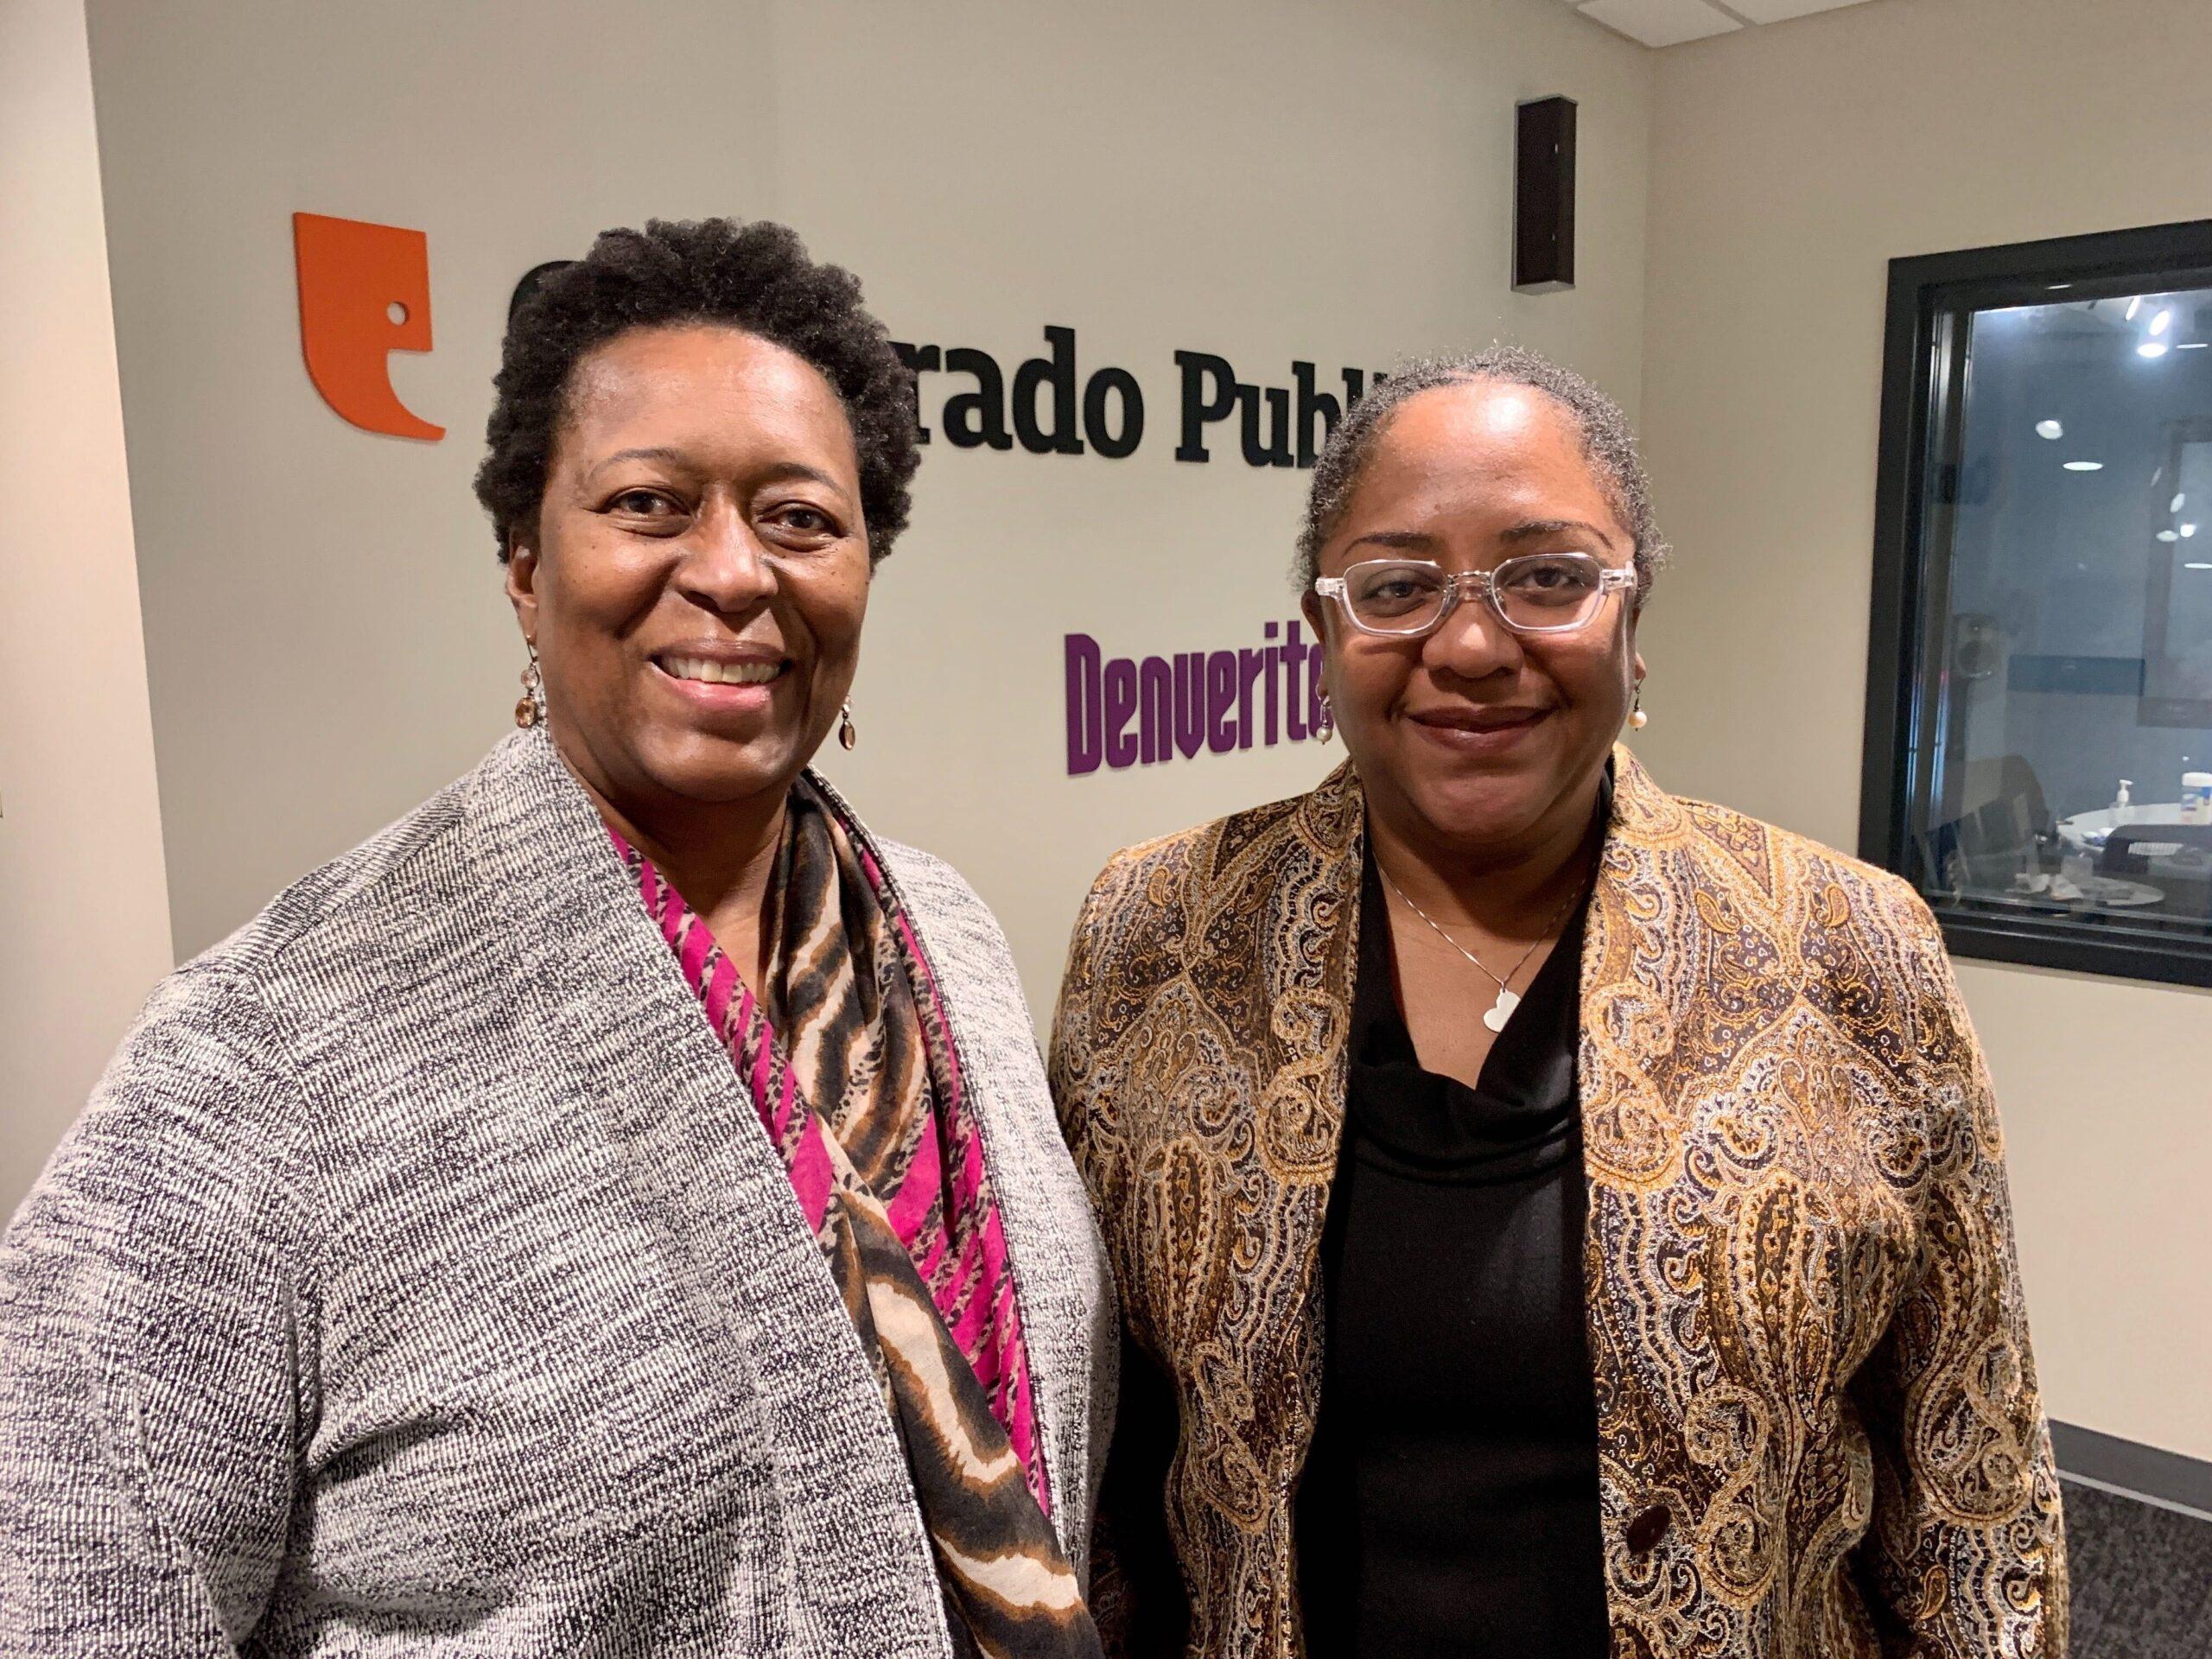 Judge Claudia Jordan Jill Dorancy Black Women Judges Colorado Denver